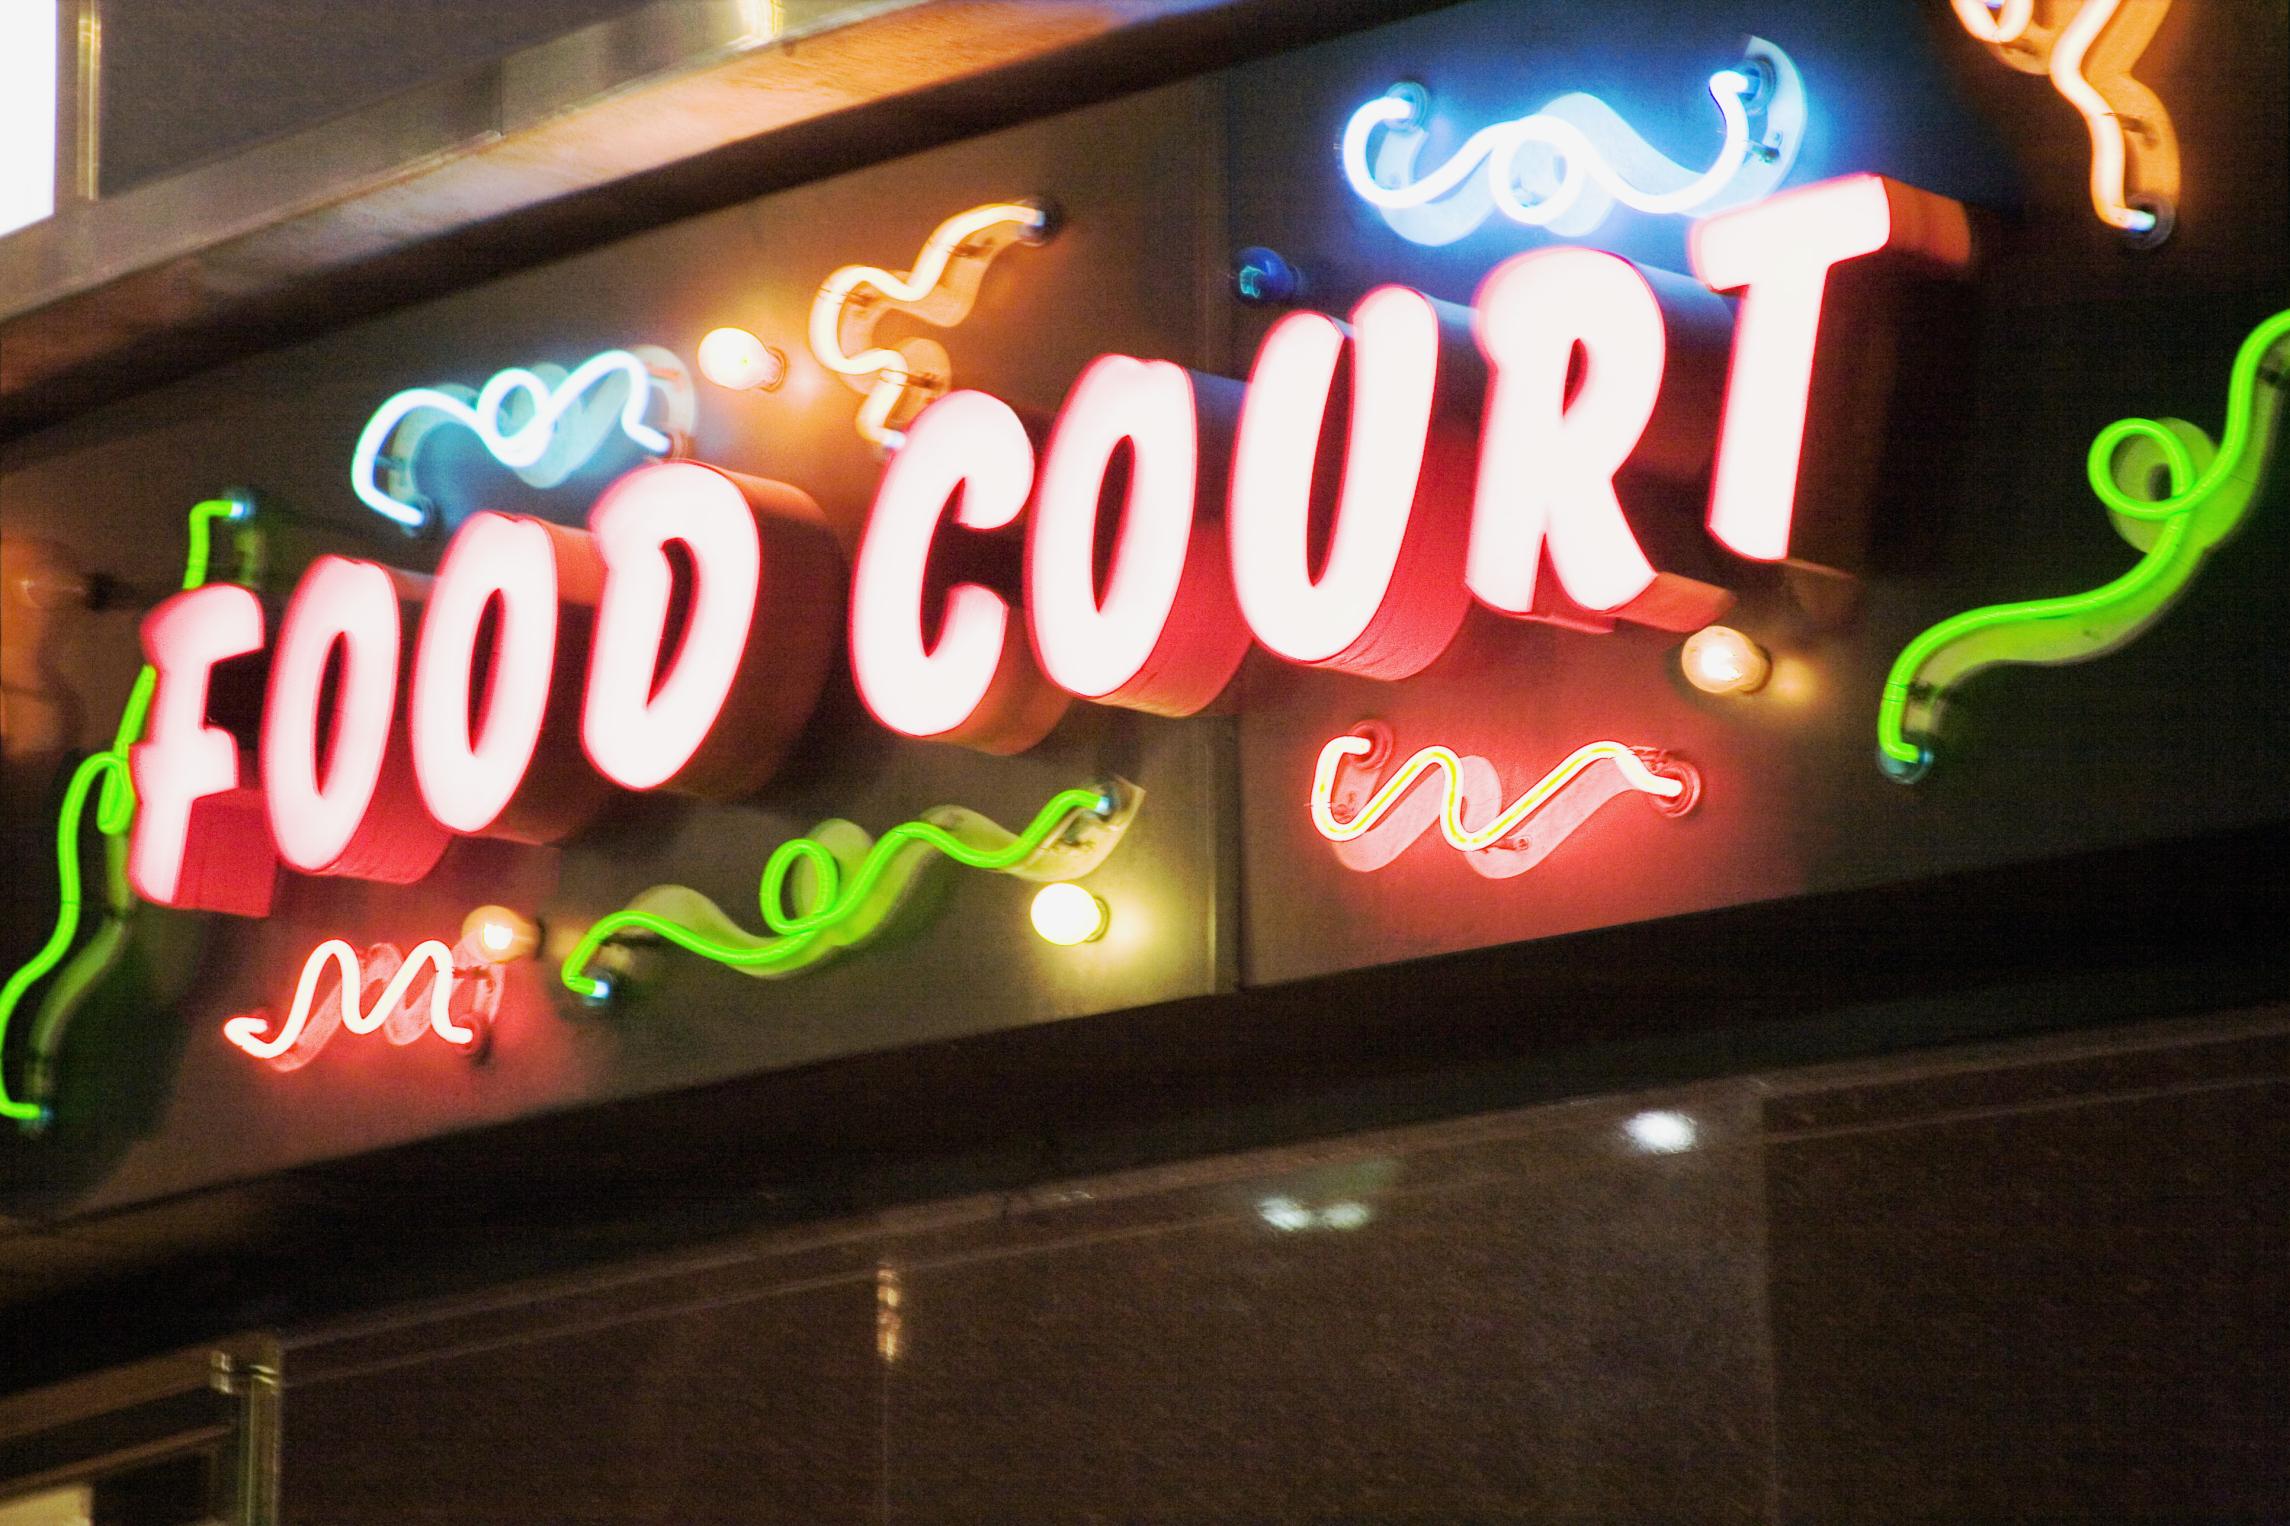 Peachtree Center Food Court List